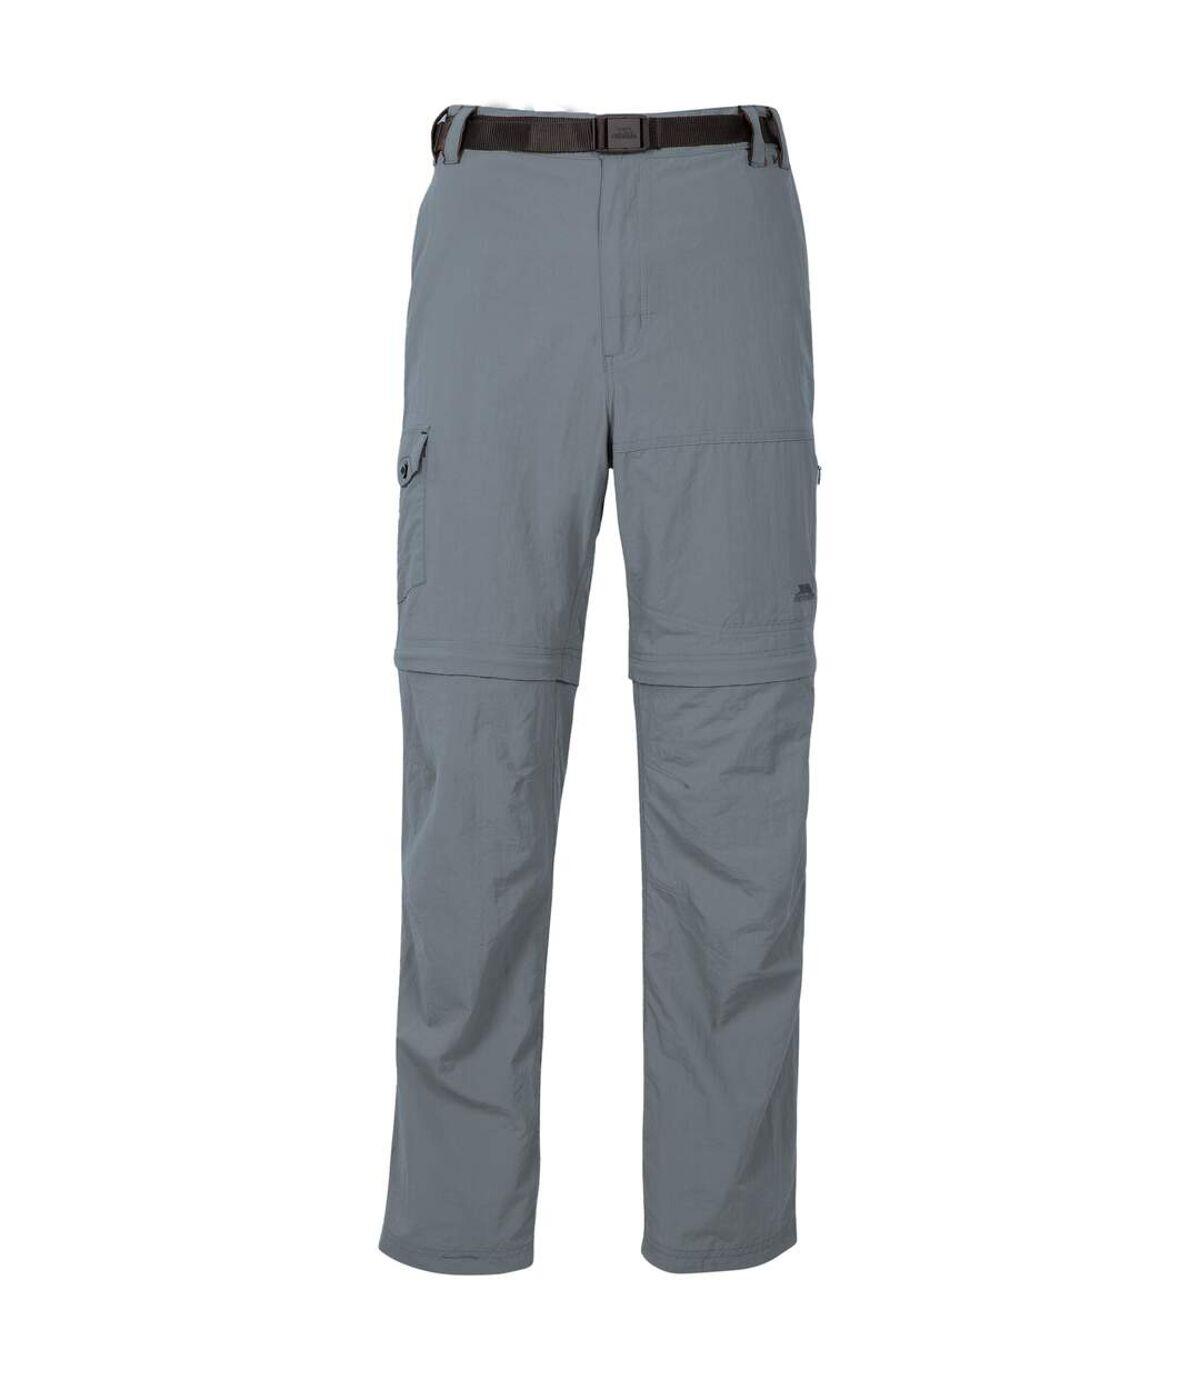 Trespass Mens Rynne Moskitophobia Hiking Trousers (Olive) - UTTP4059